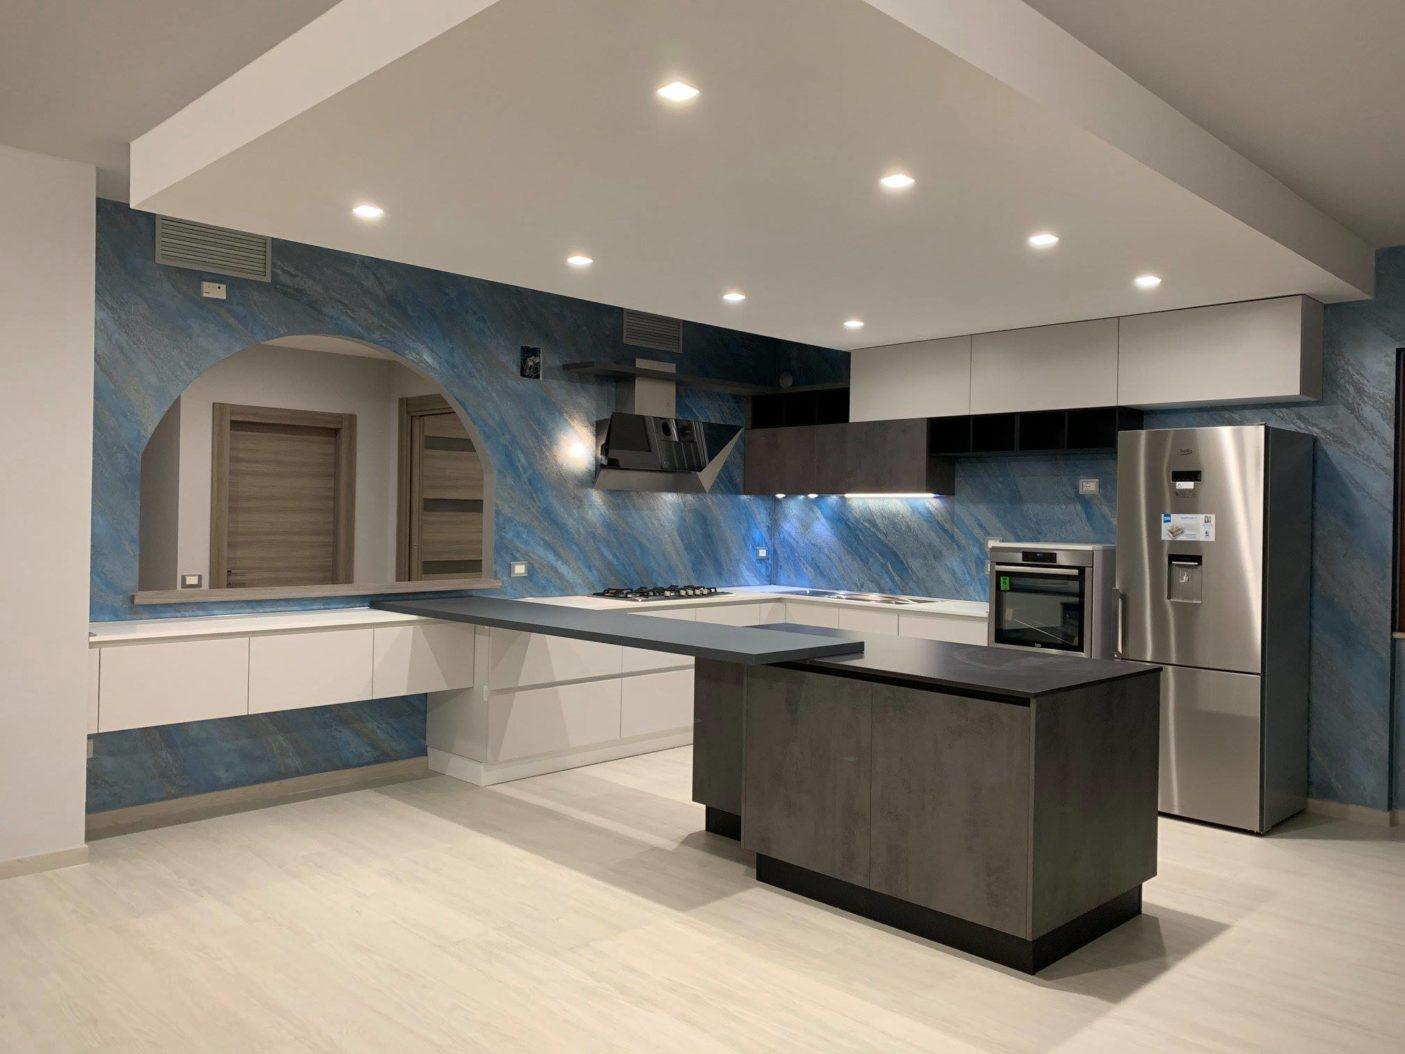 Cucina-Creo-Kitchens-Tablet-dekton-Cosentino5.jpg